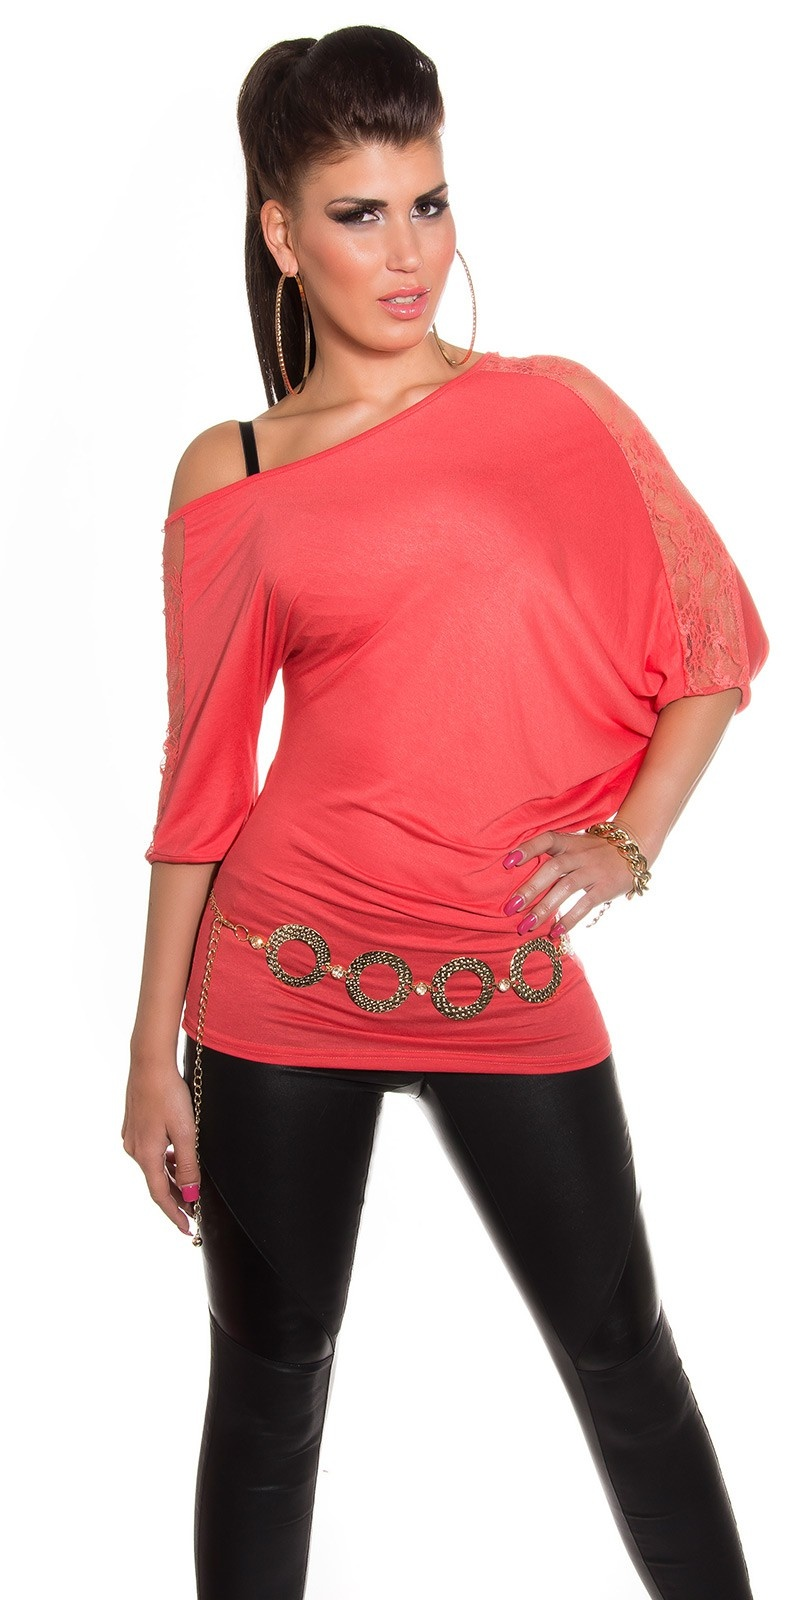 Sexy vleermuis-shirt asymmetrisch koraal-kleurig